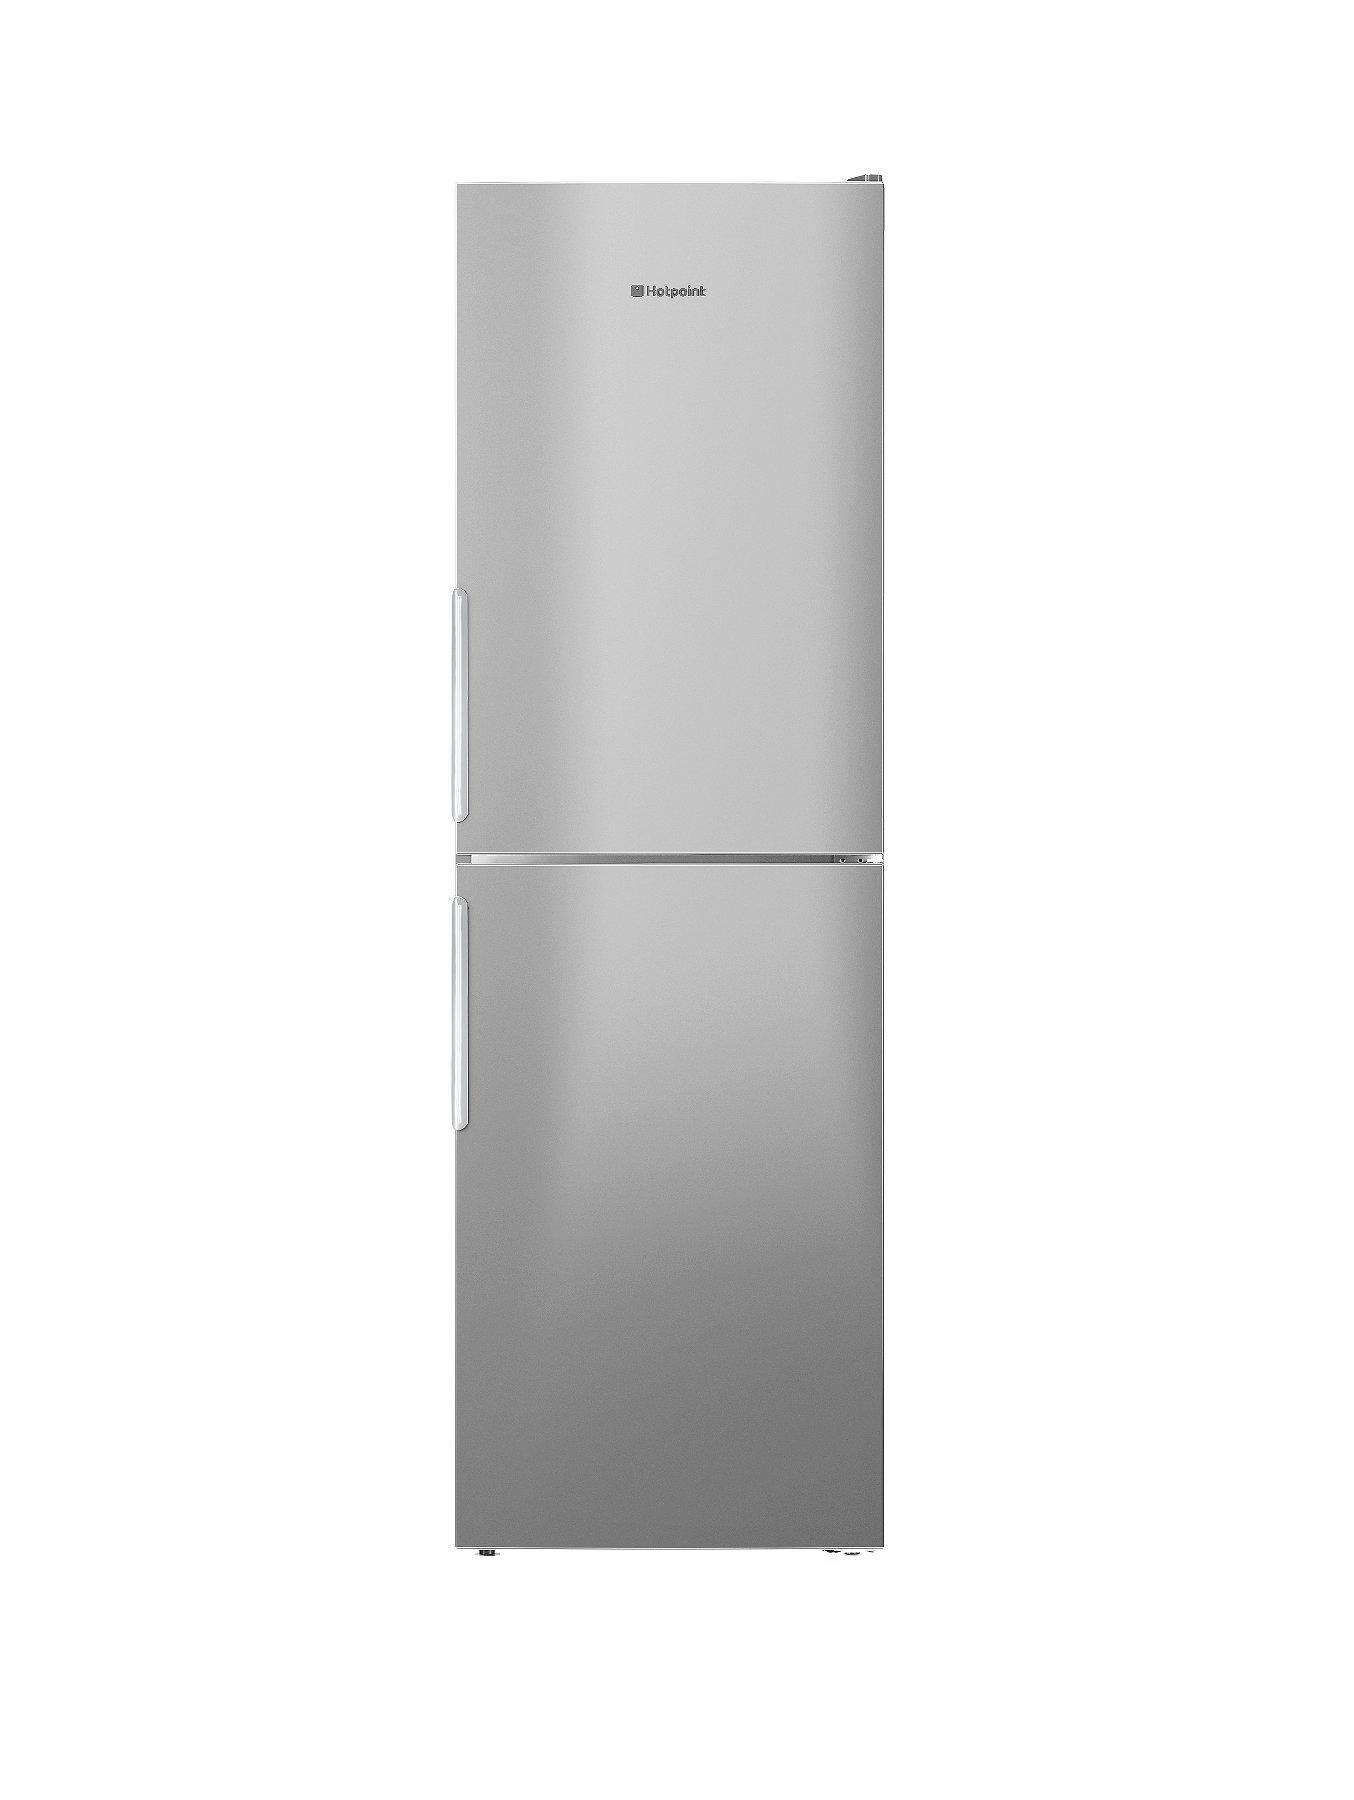 Hotpoint Day 1 XEX95T1IGZ 60cm Frost Free Fridge Freezer Graphite